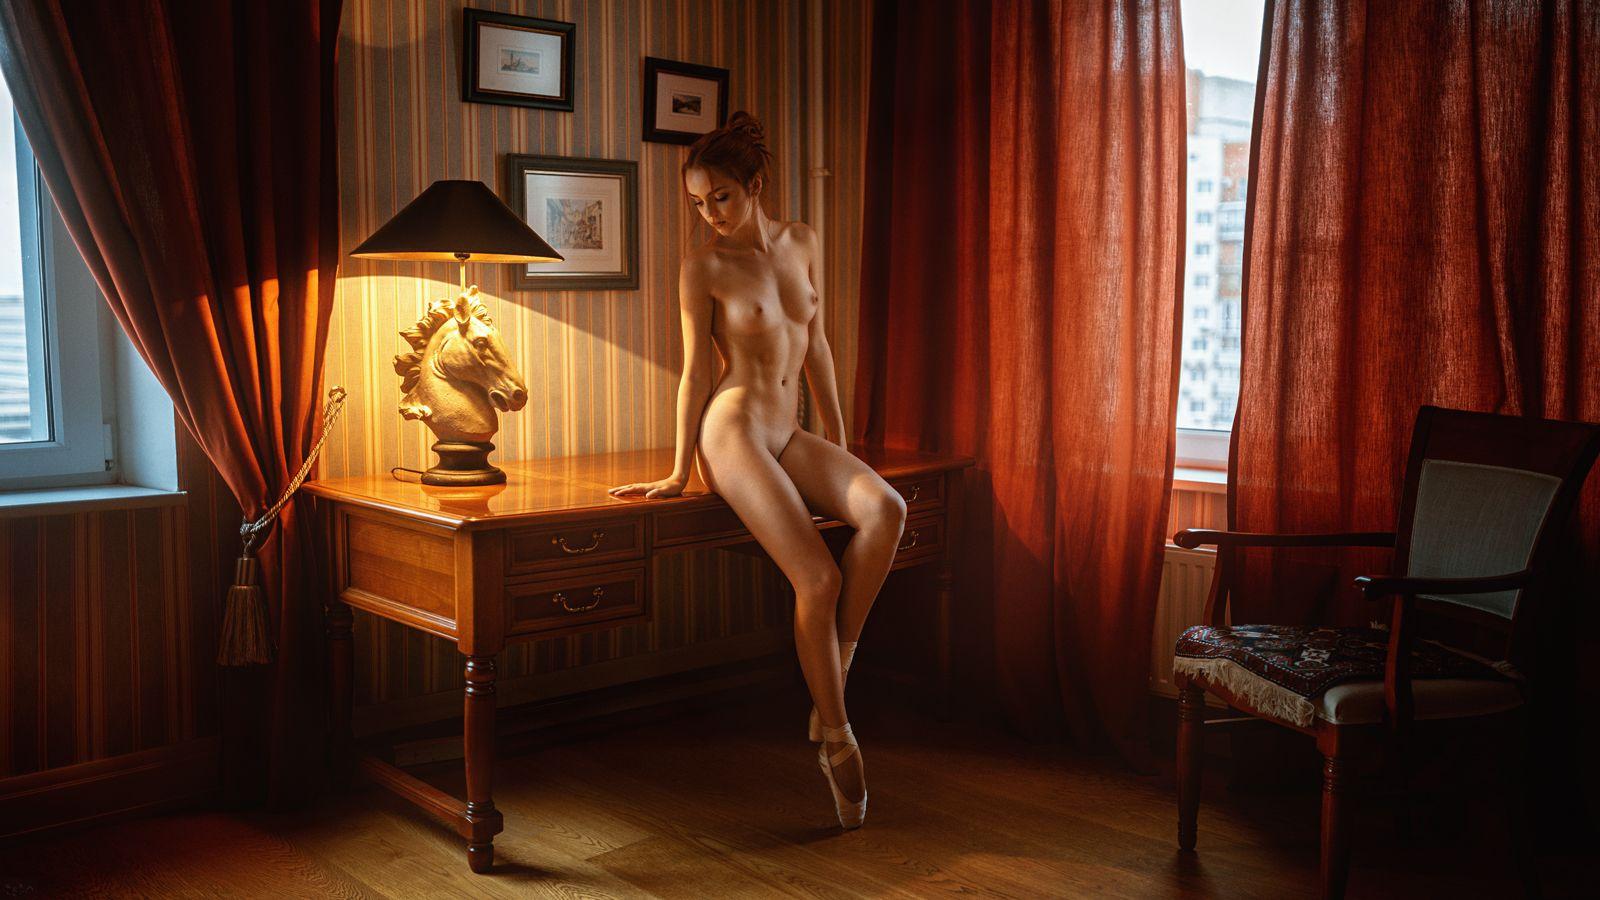 Alt binaries free erotic photography galleries